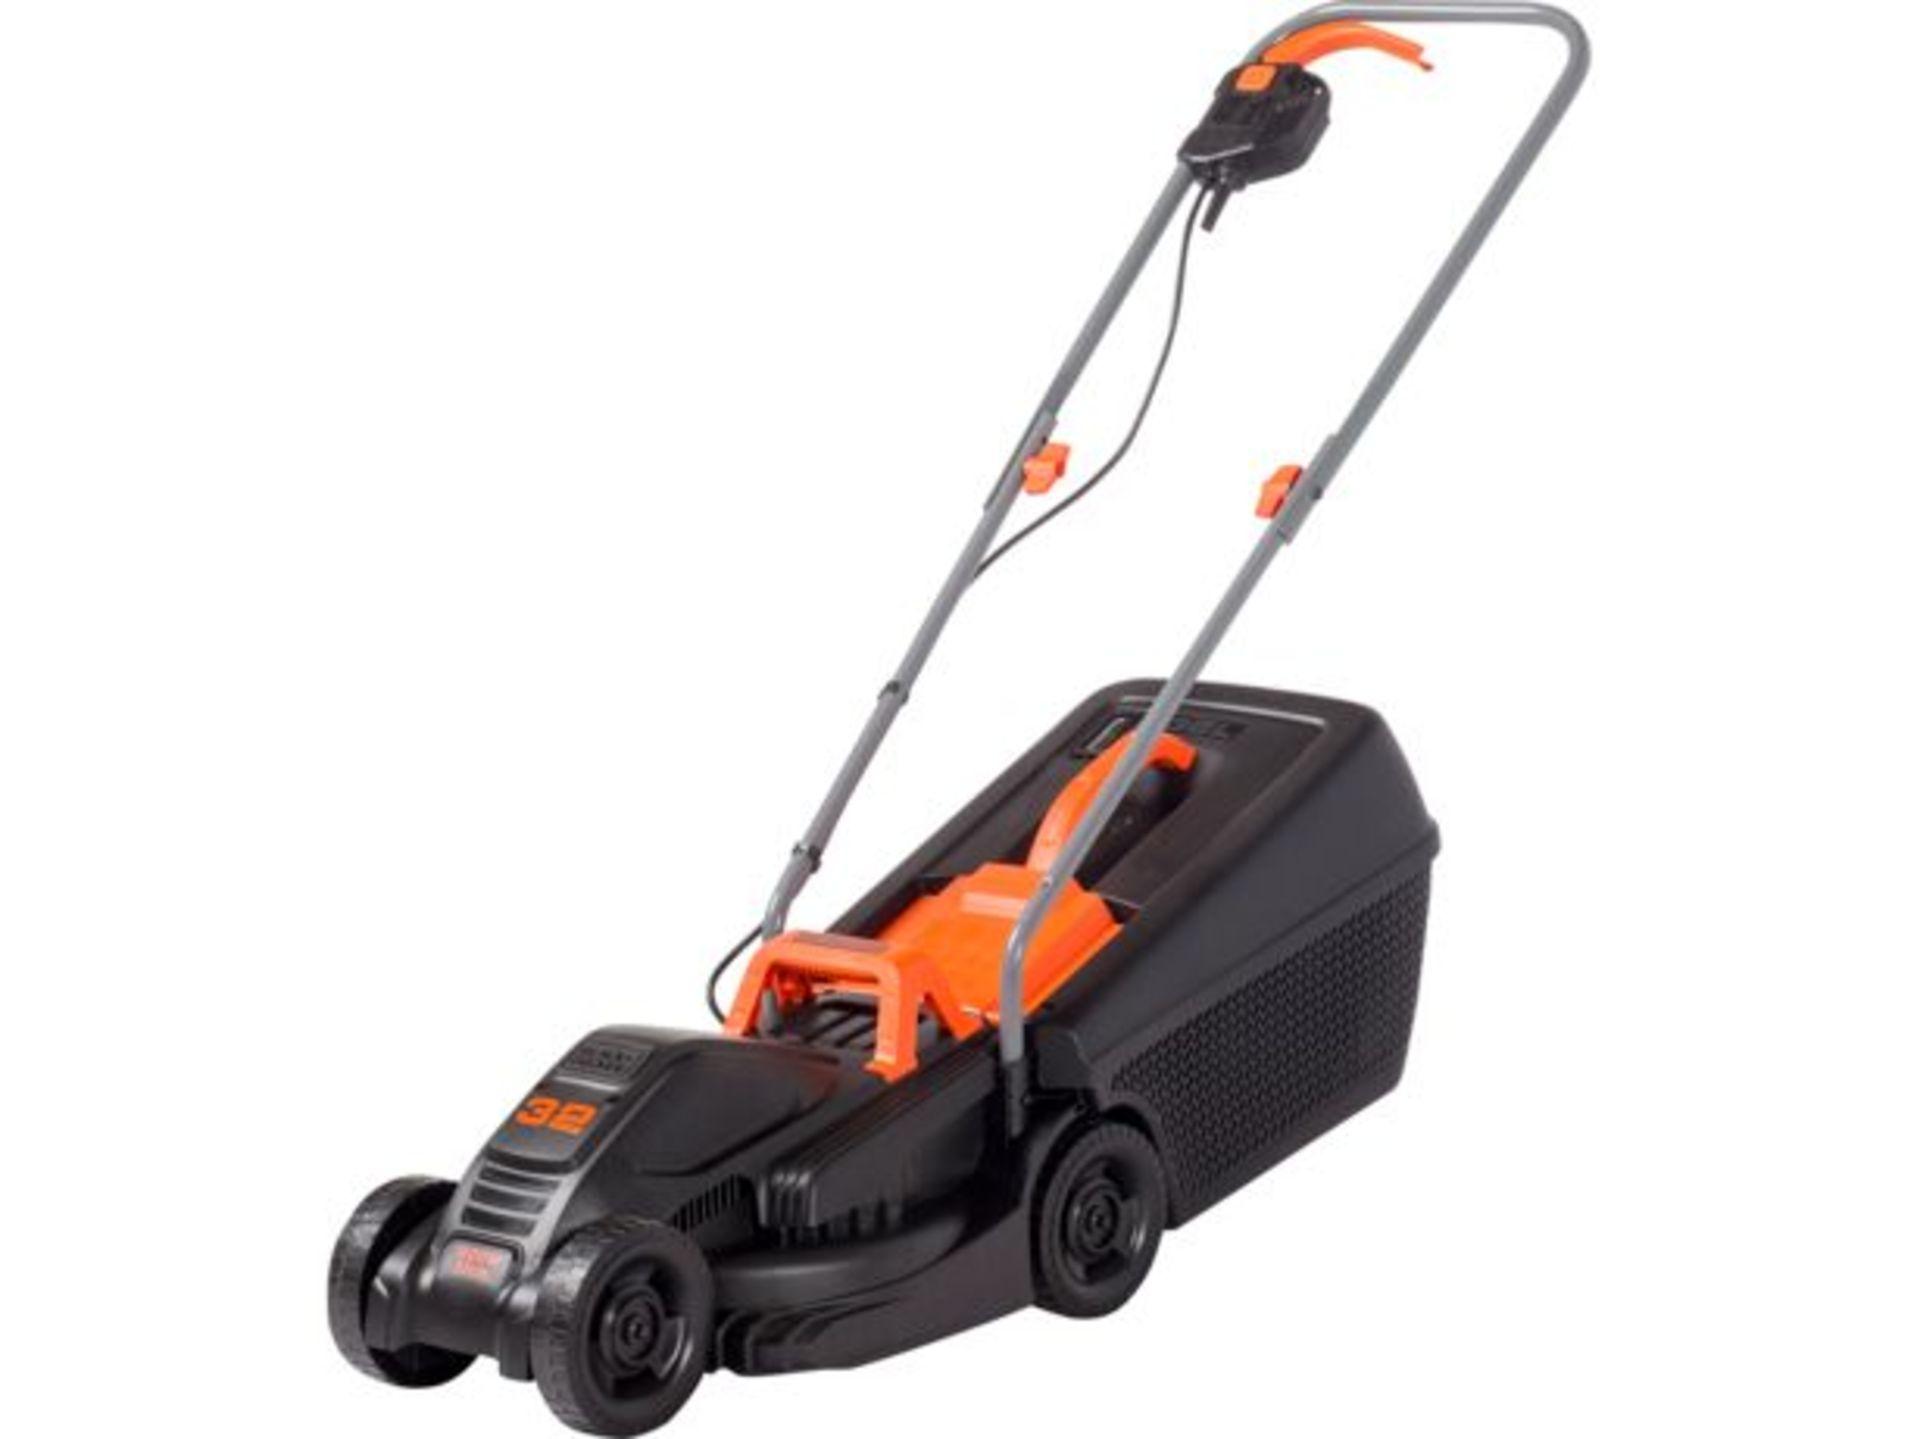 (P5) 1x Black & Decker 32cm 1000W Corded Lawn Mower & Strimmer RRP £99. Contents Appear Clean, Unus - Image 2 of 5